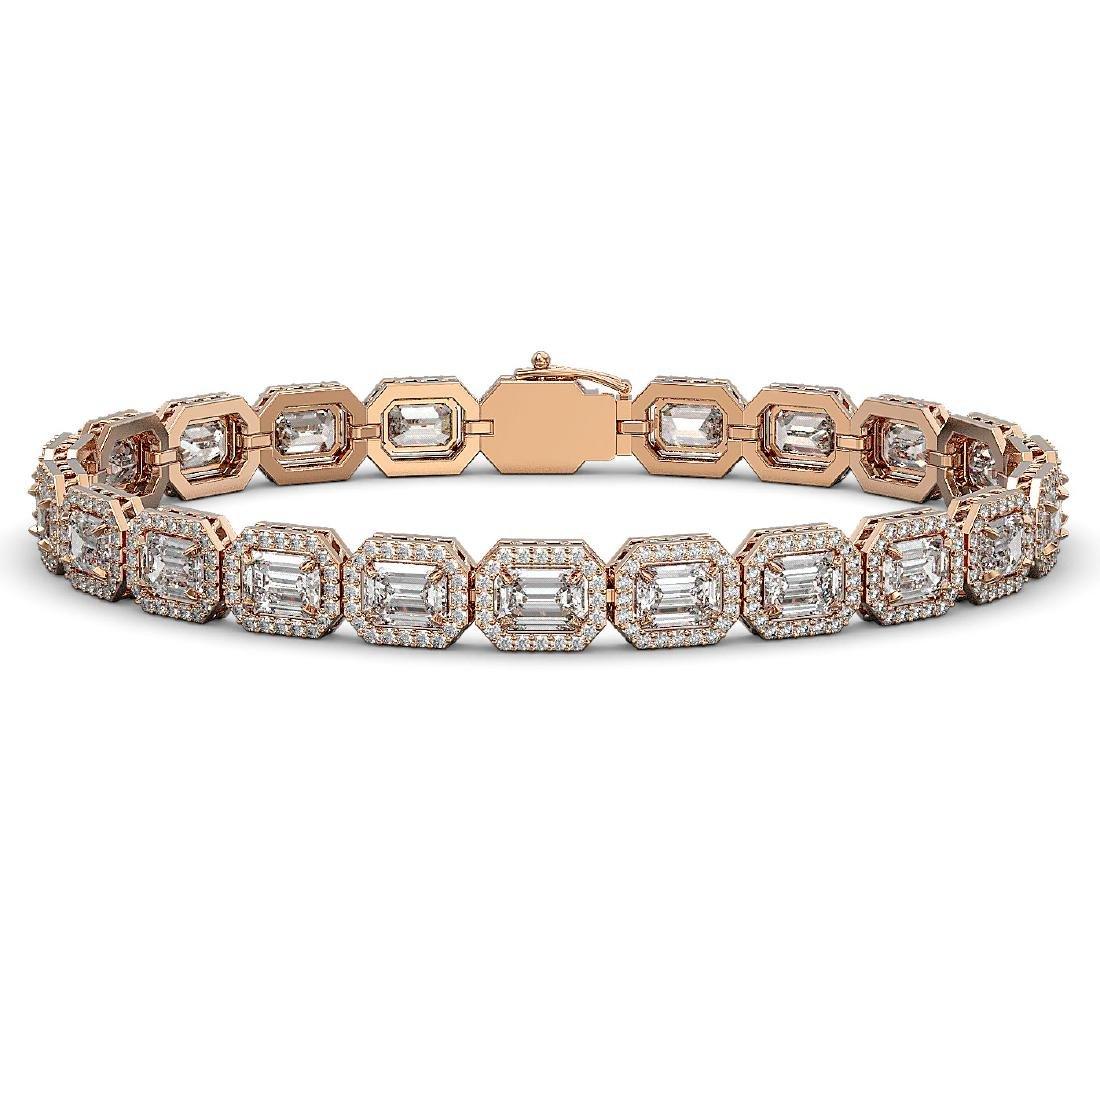 14.57 CTW Emerald Cut Diamond Designer Bracelet 18K